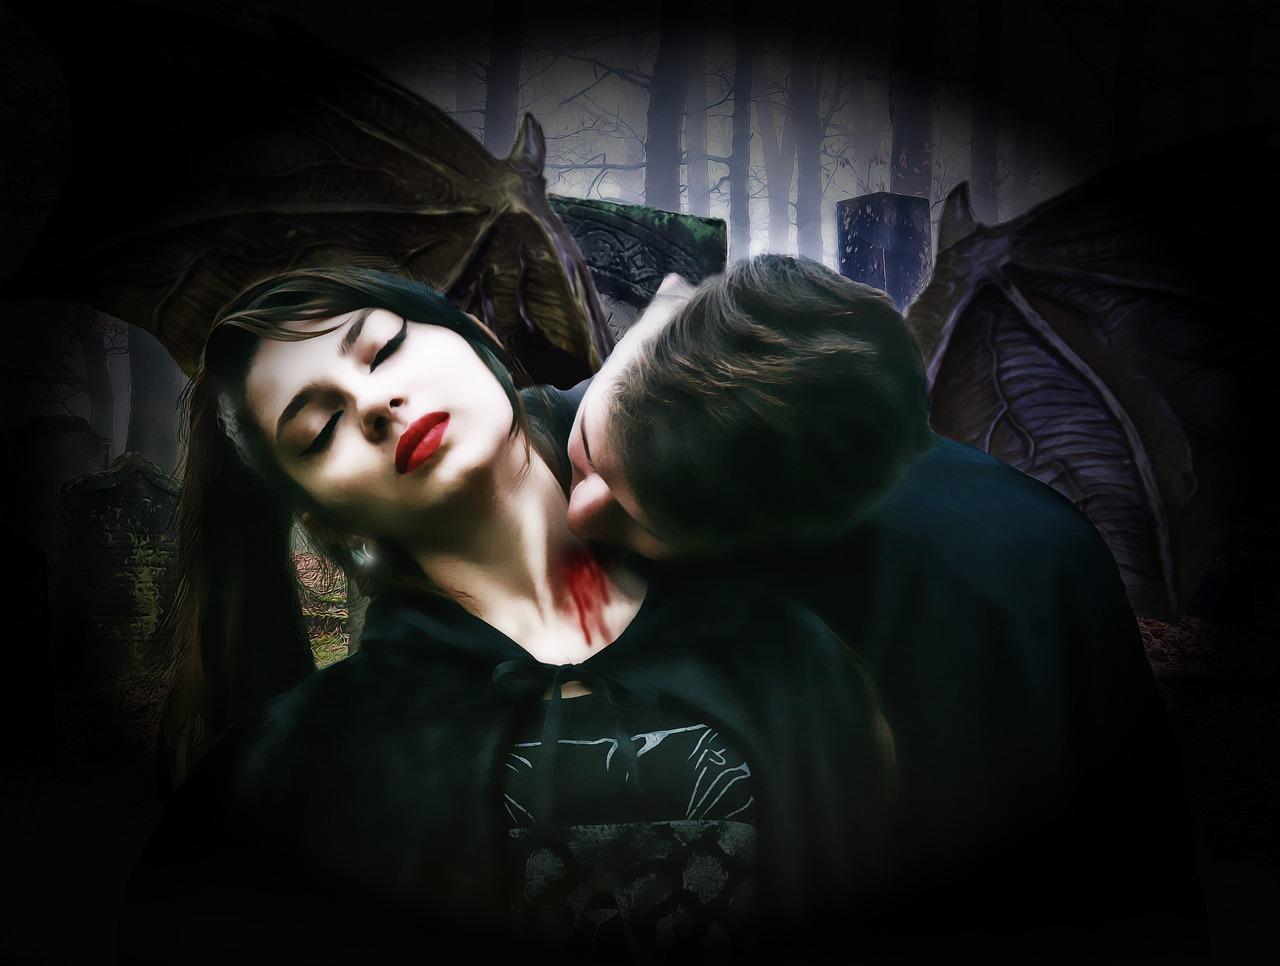 Serie TV e vampiri